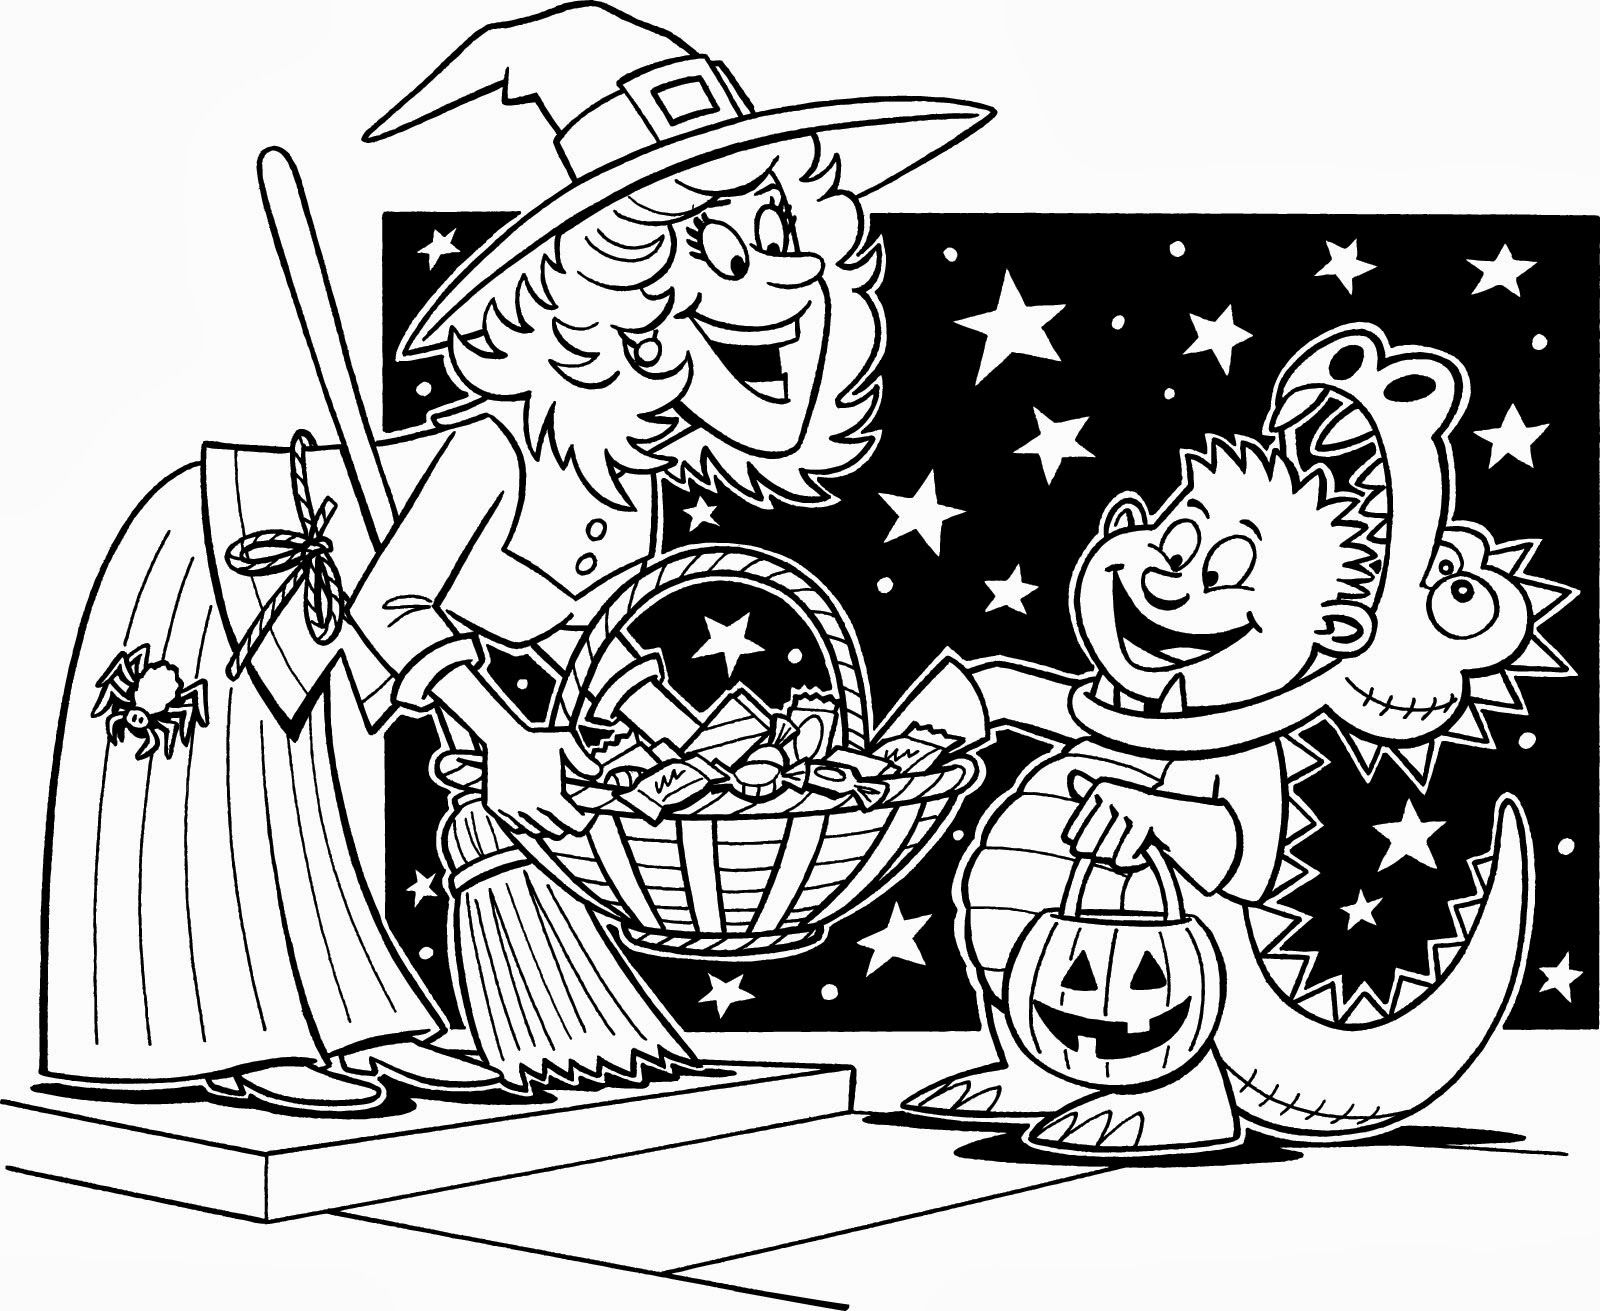 Trick Or Treat Worksheet Education Com Halloween Coloring Halloween Coloring Pictures Halloween Coloring Sheets